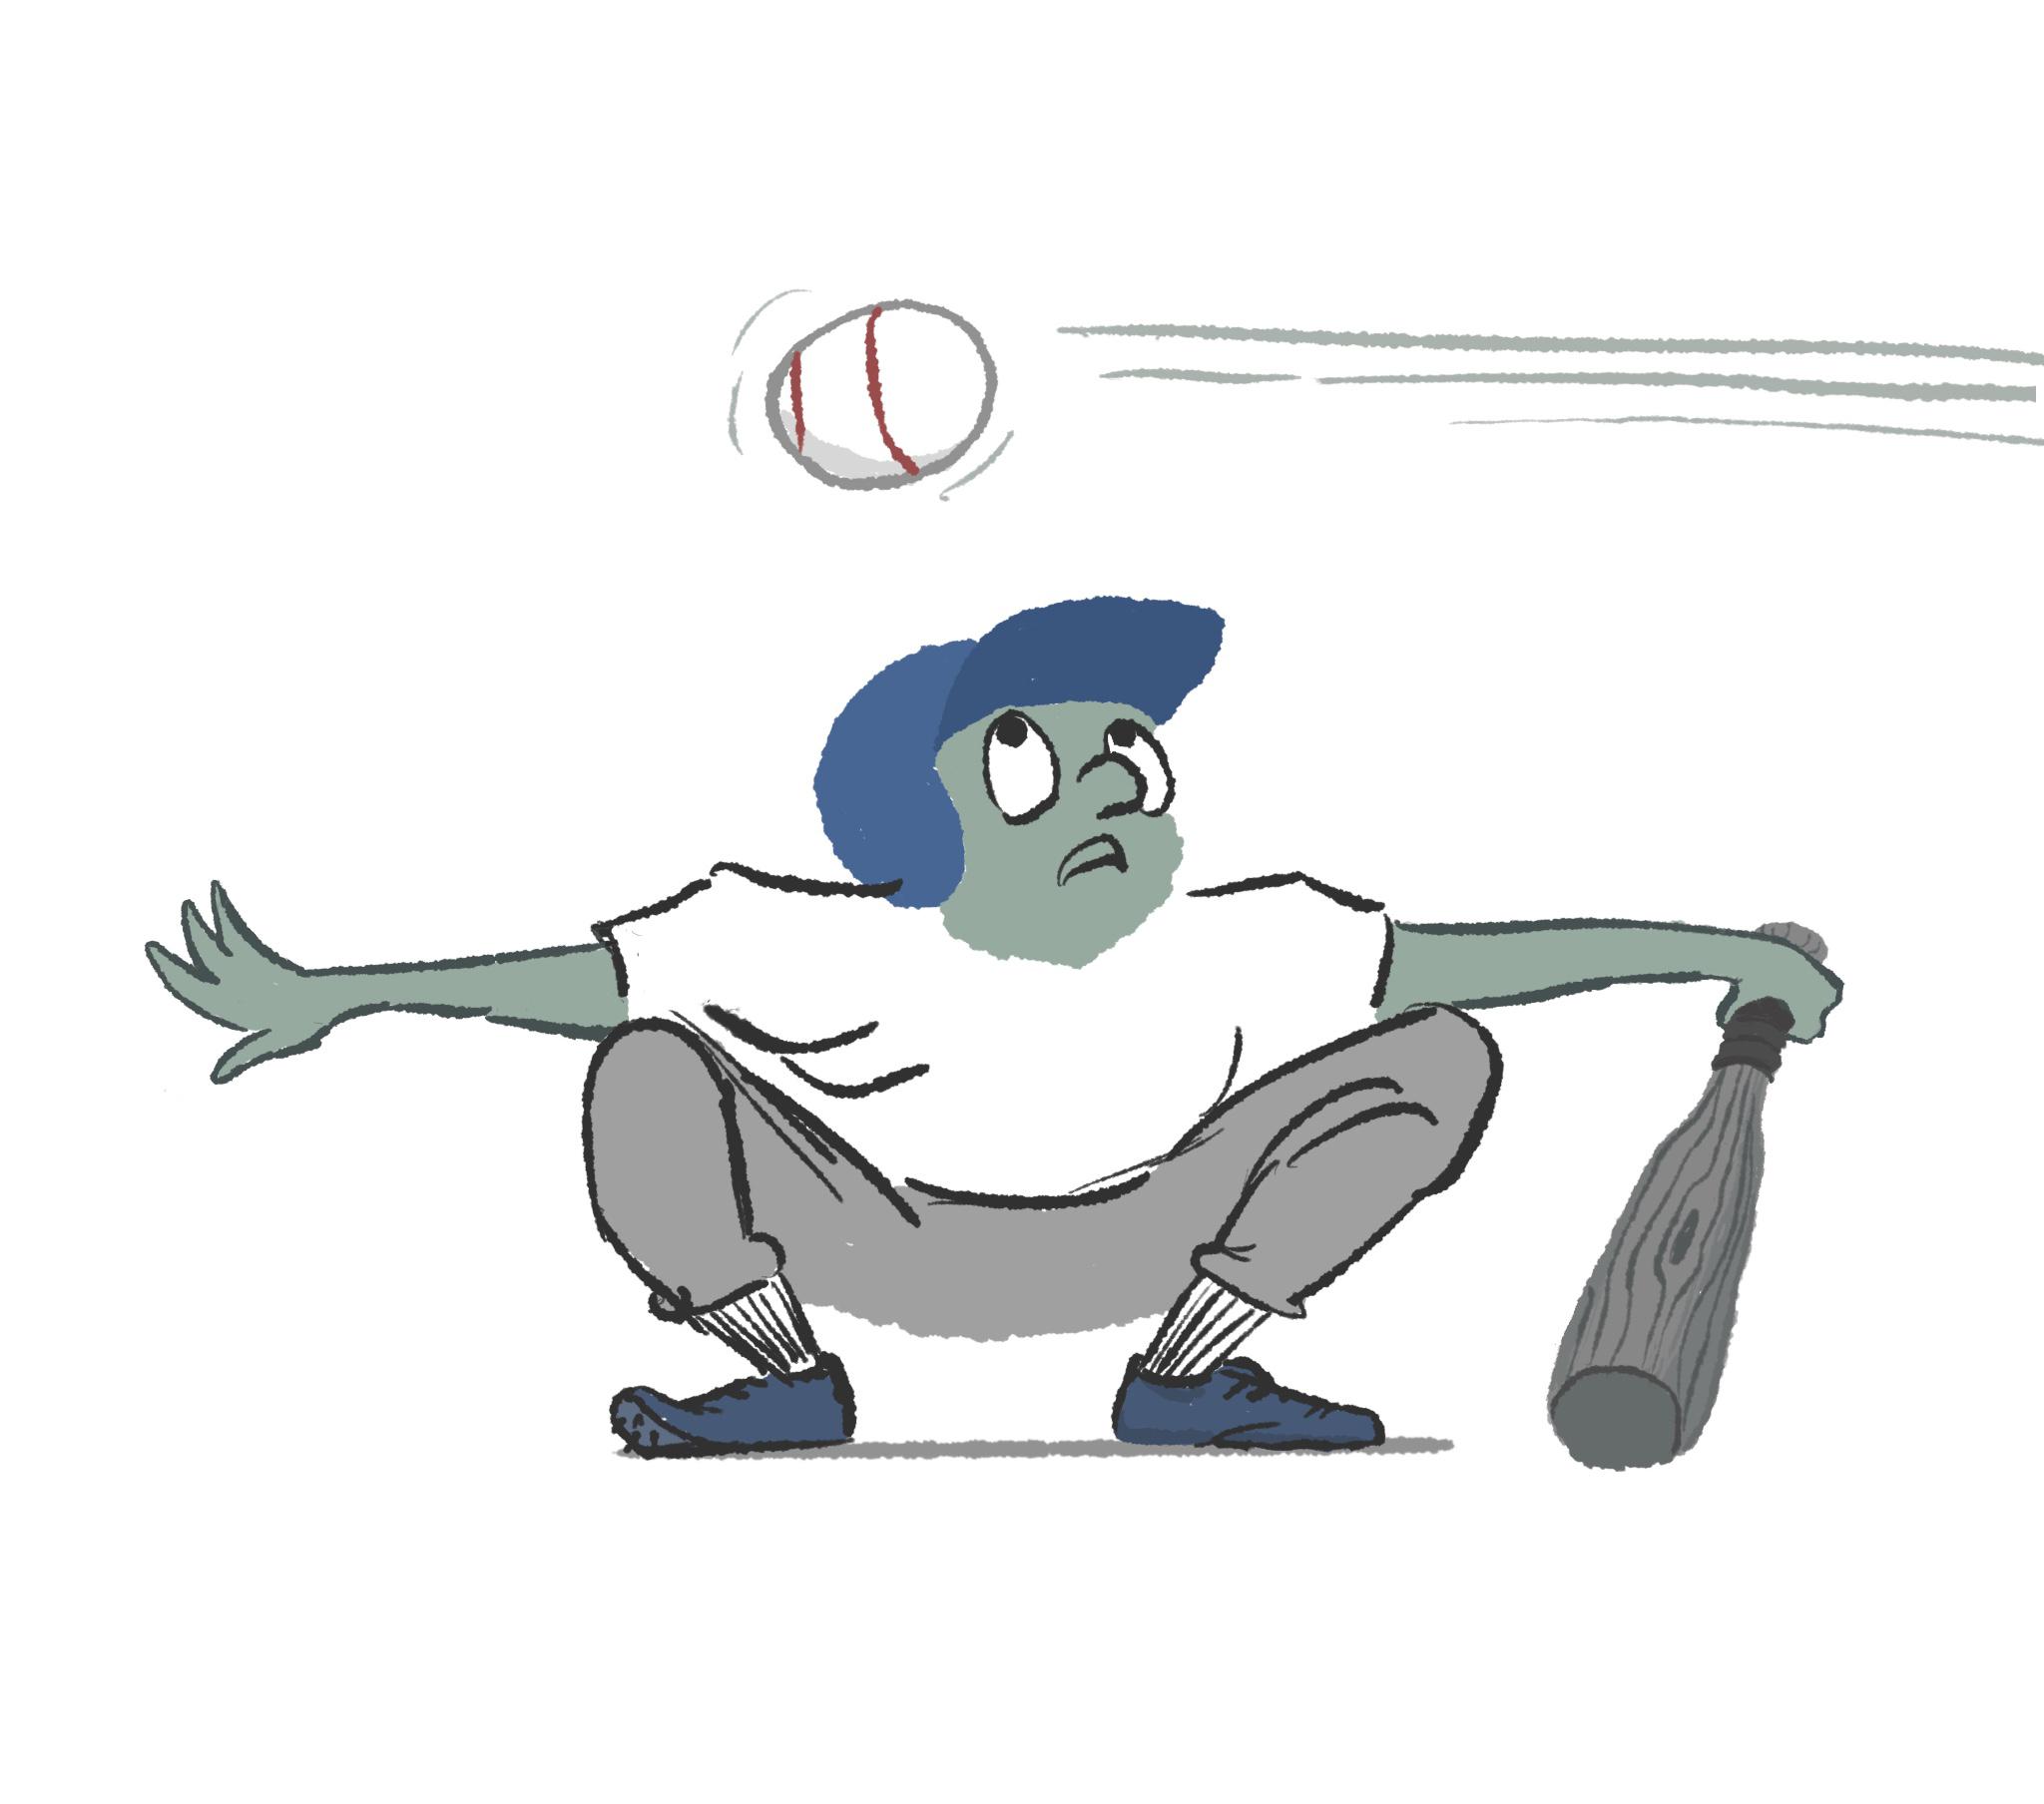 Baseball_Player_01_Cropped.jpg